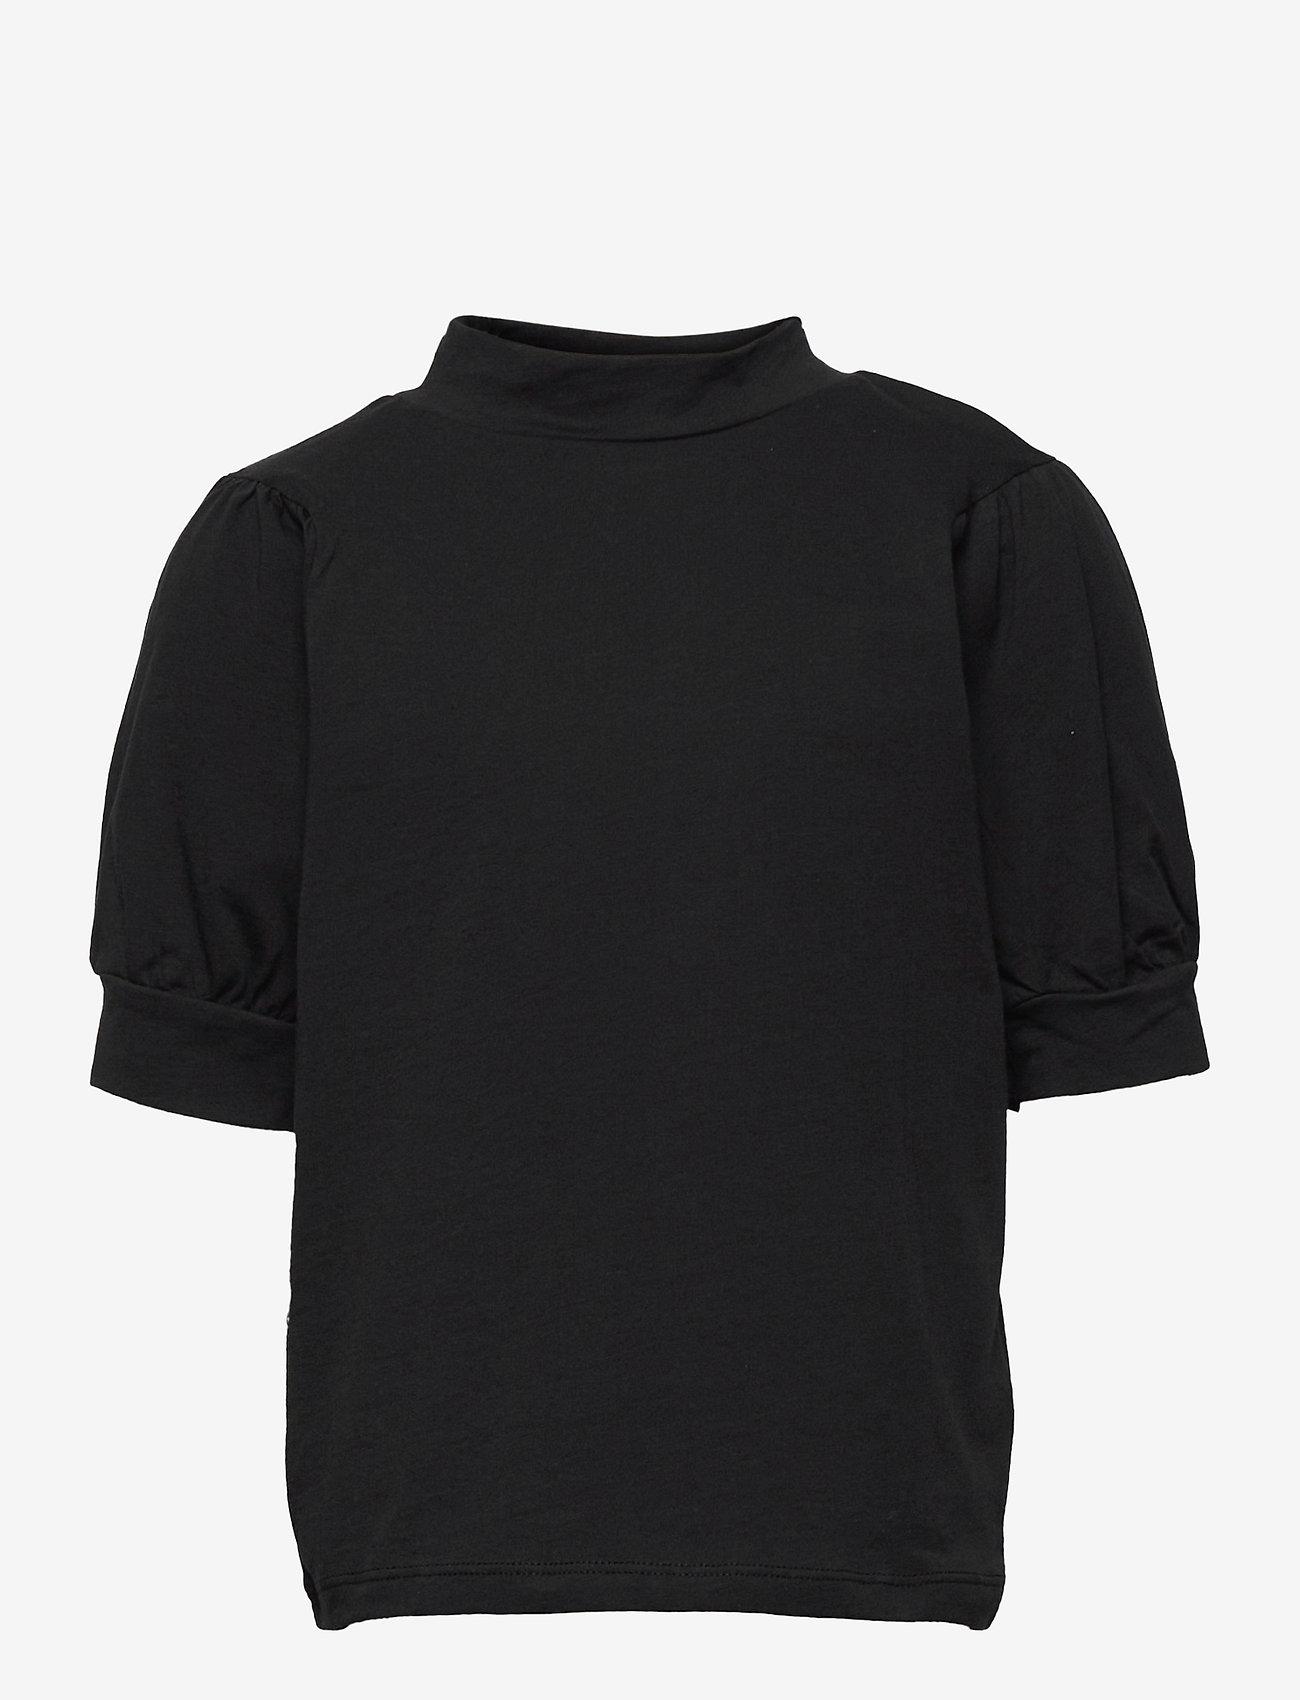 LMTD - NLFFUFF BALLON SHORT TOP - t-shirts - black - 0